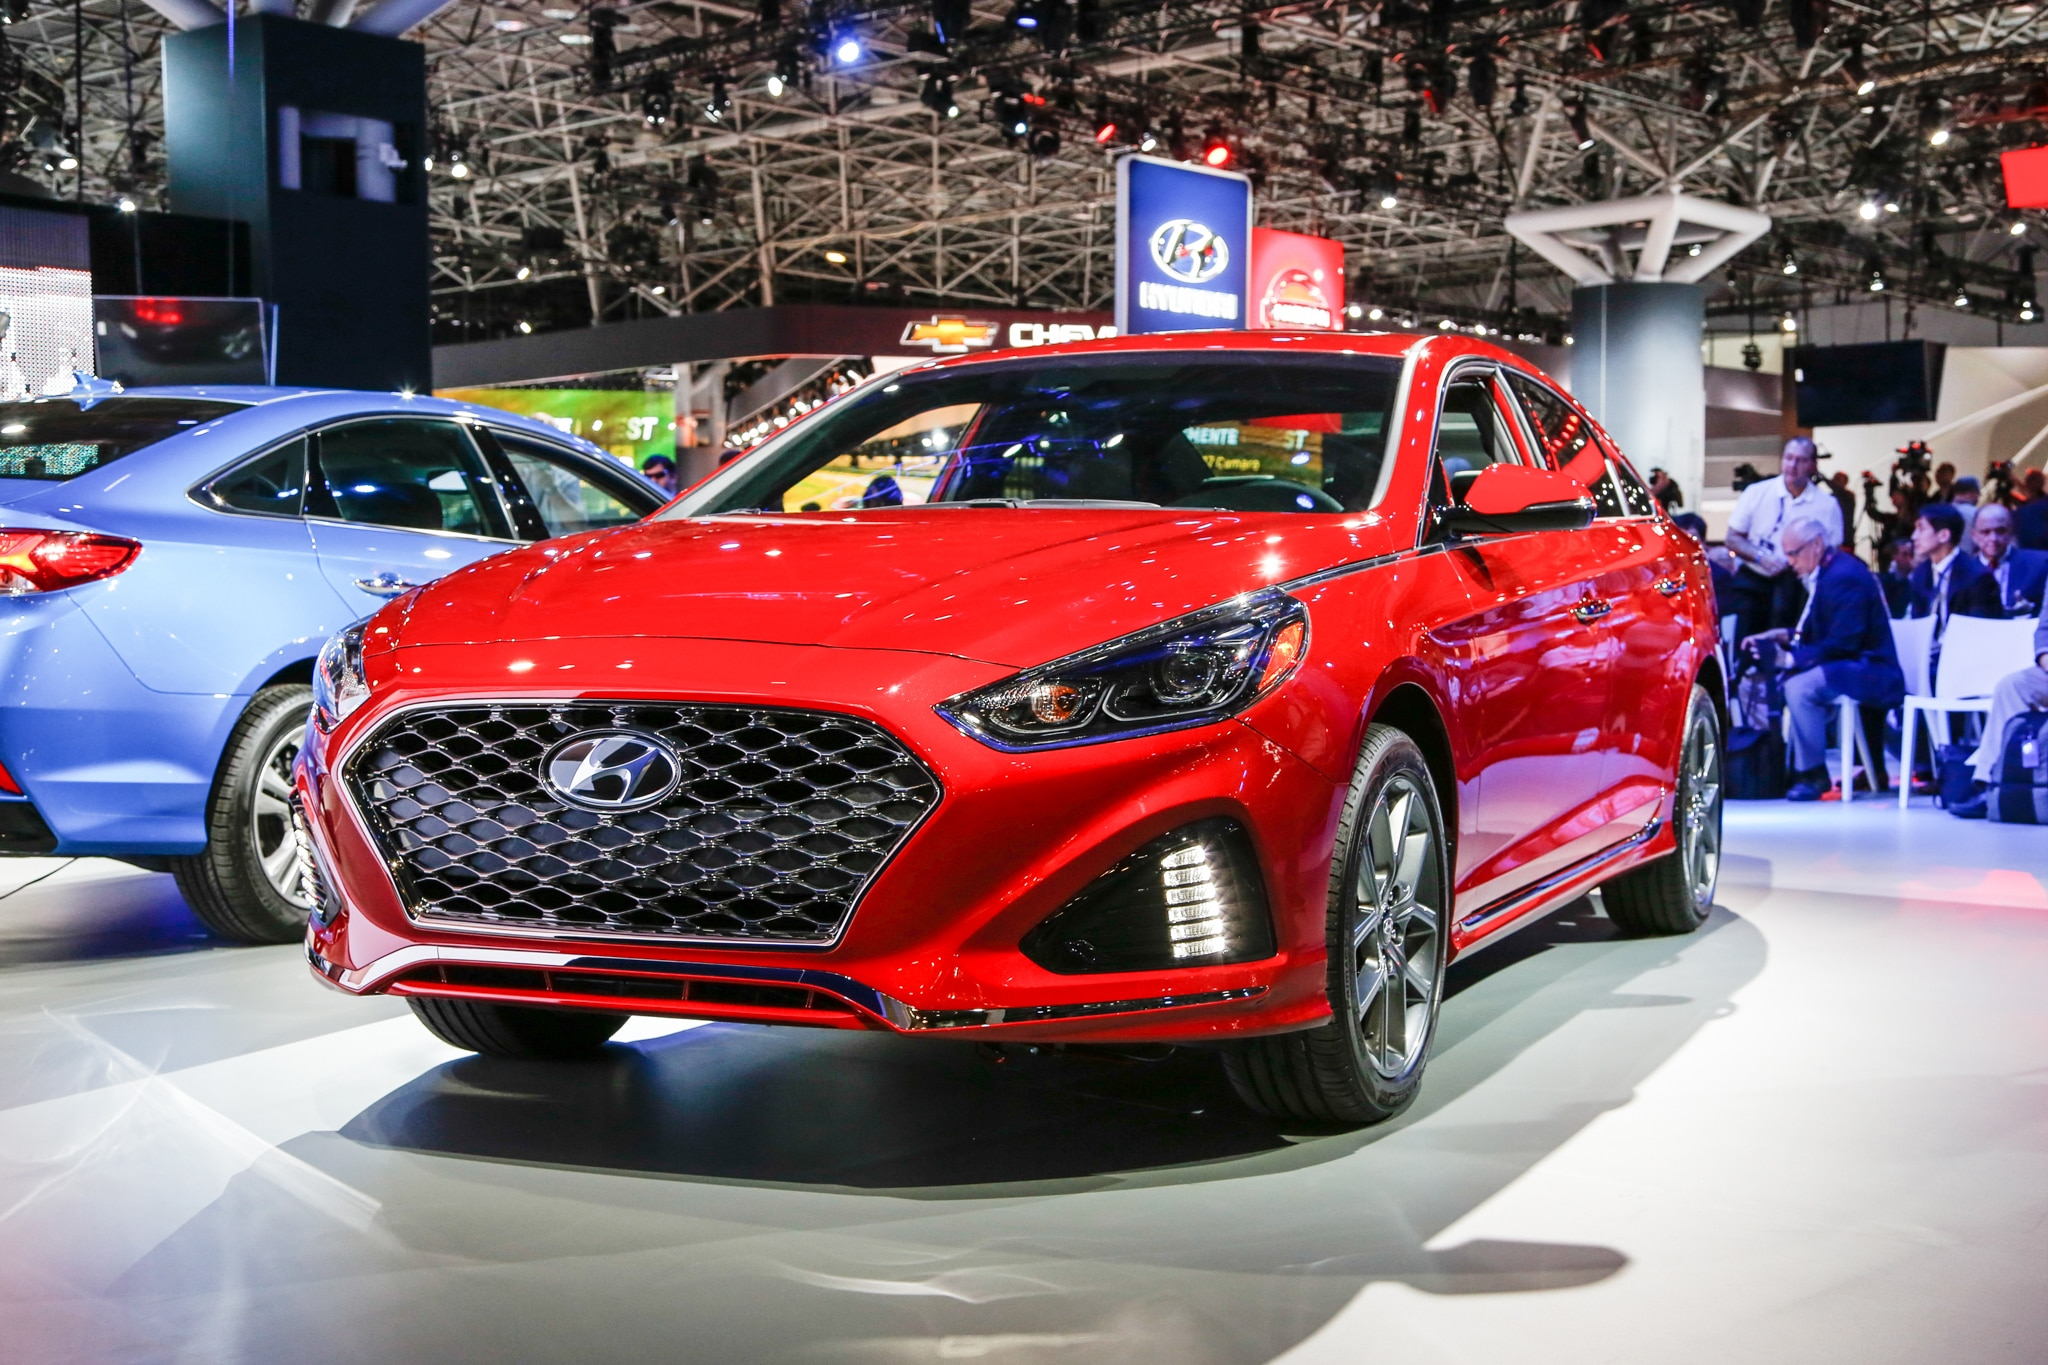 2018 Hyundai Sonata Front Three Quarter 01